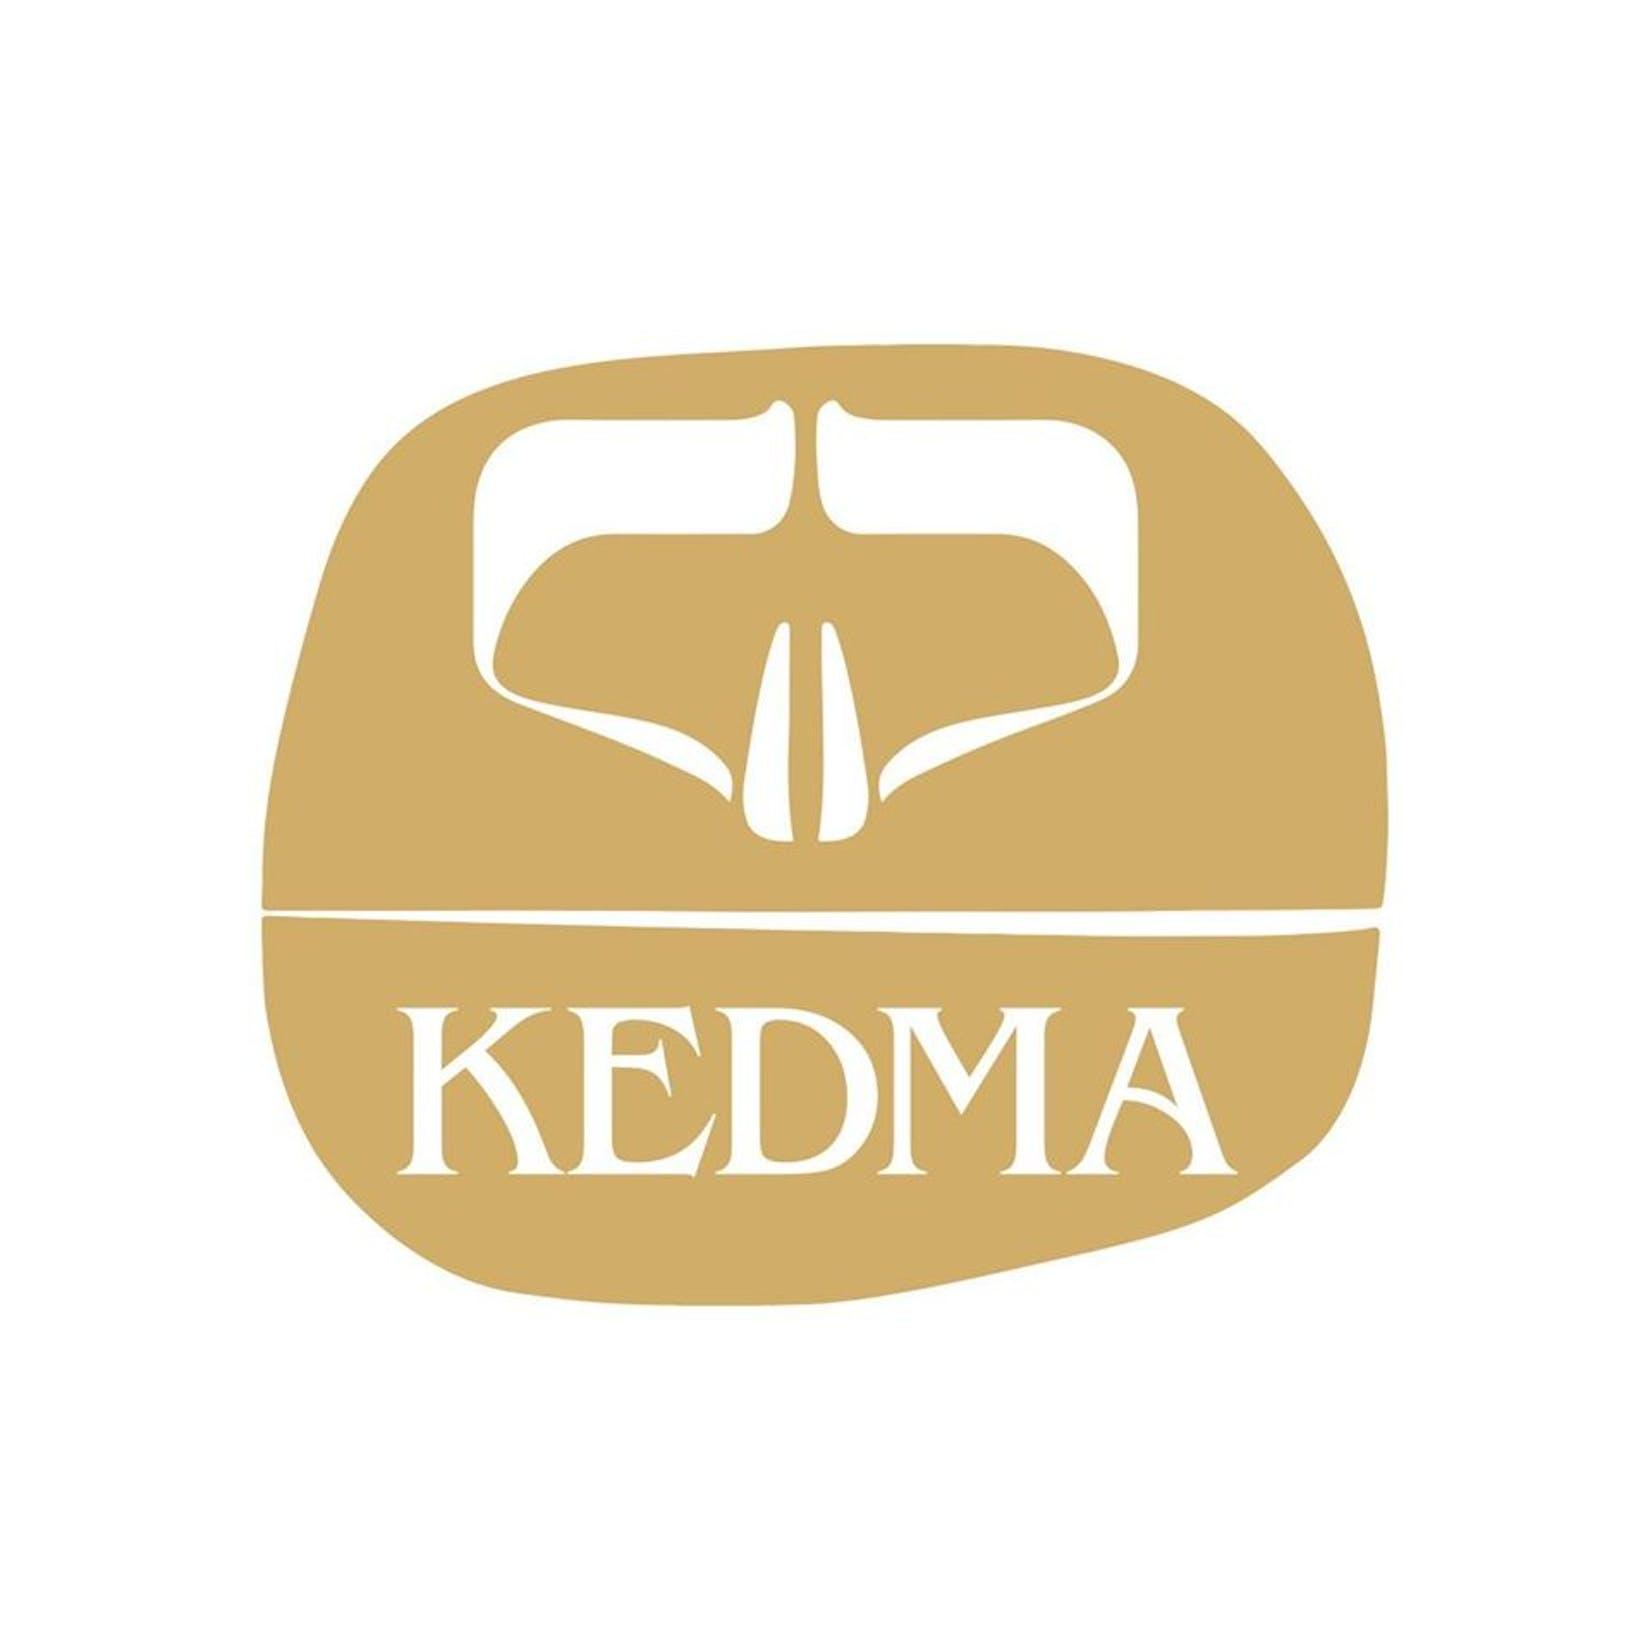 Kedma Myanmar | Beauty